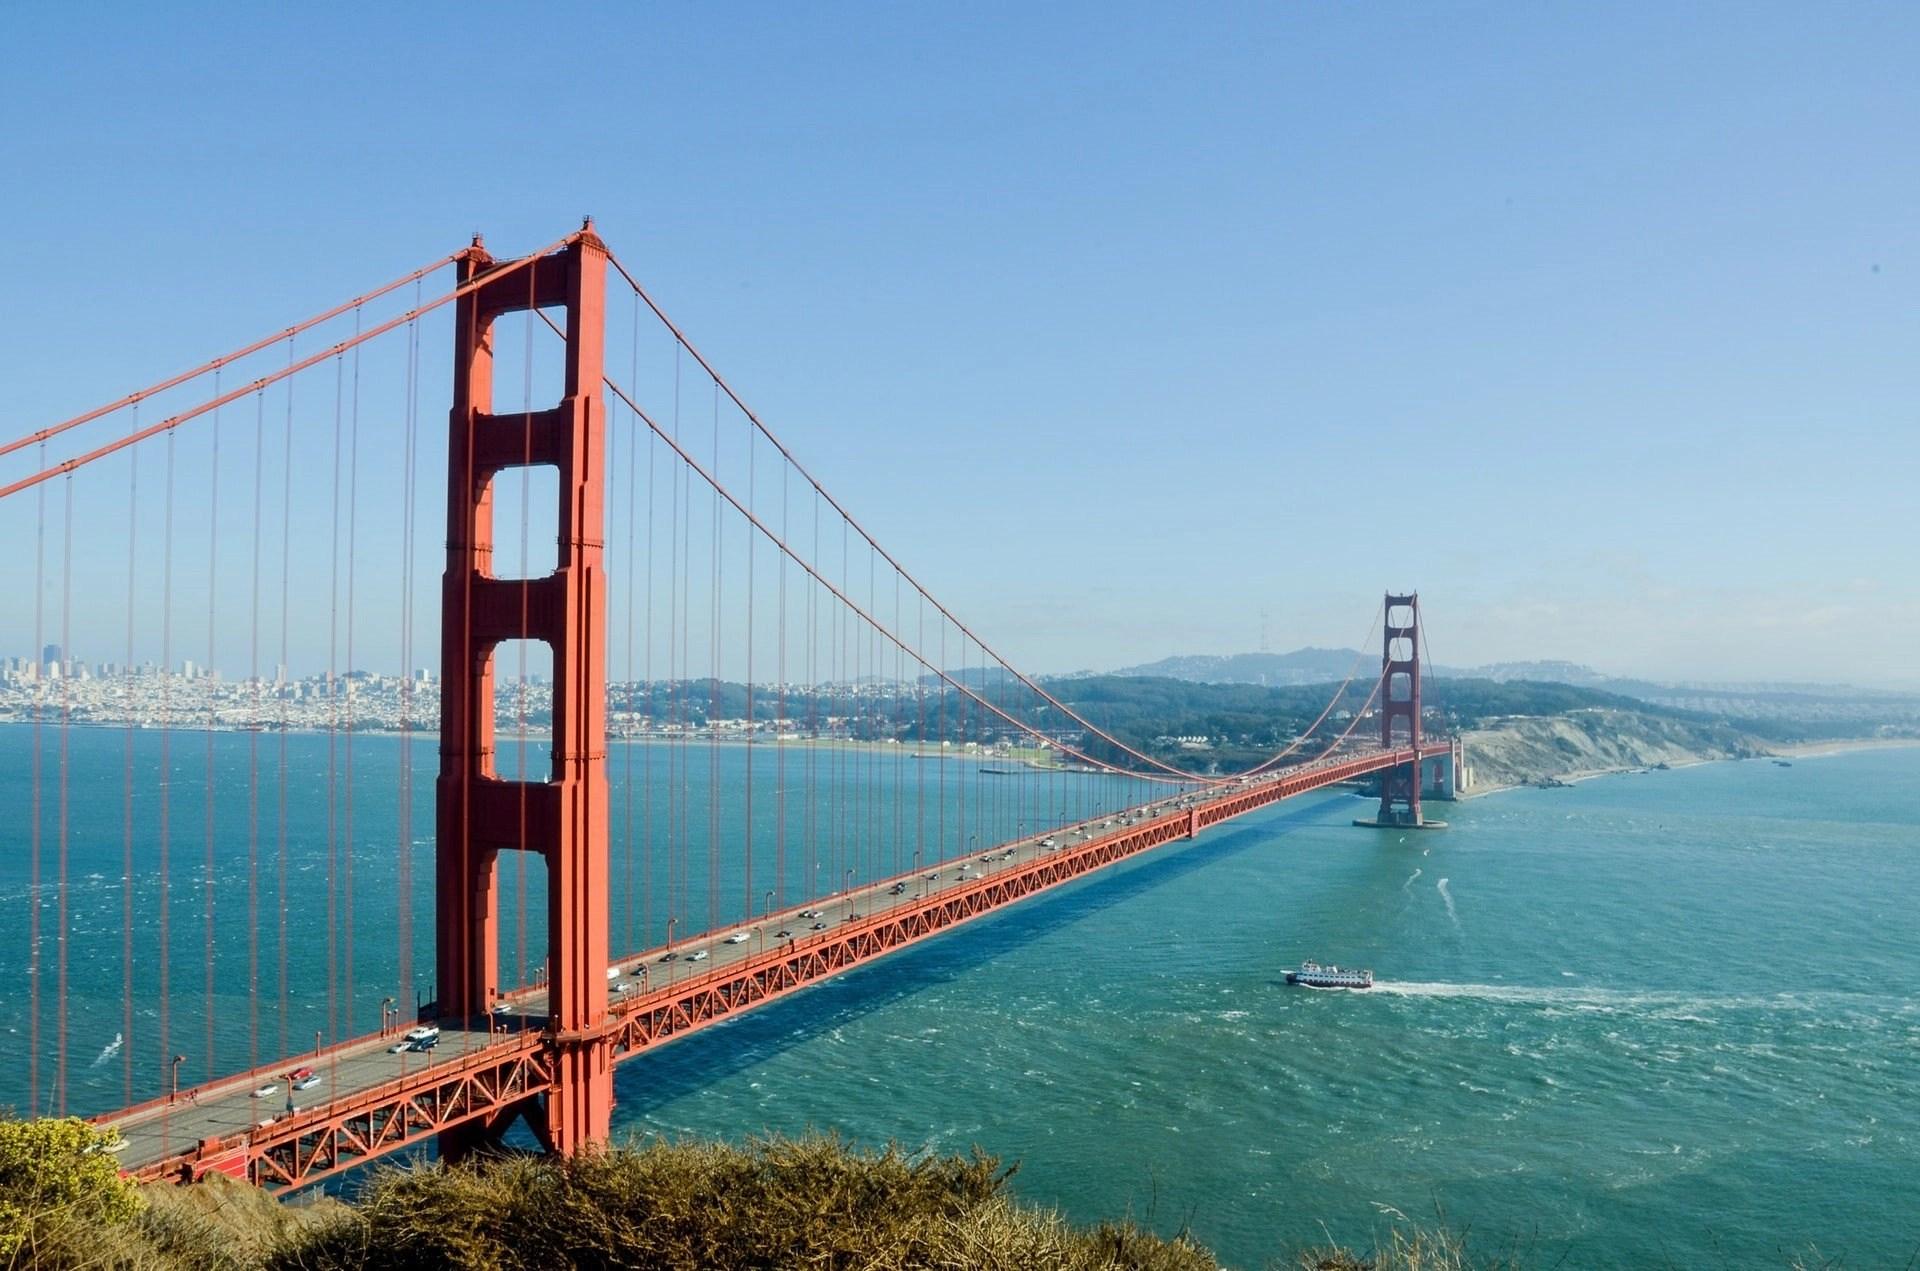 The Golden Gate Bridge in San Francisco, USA.